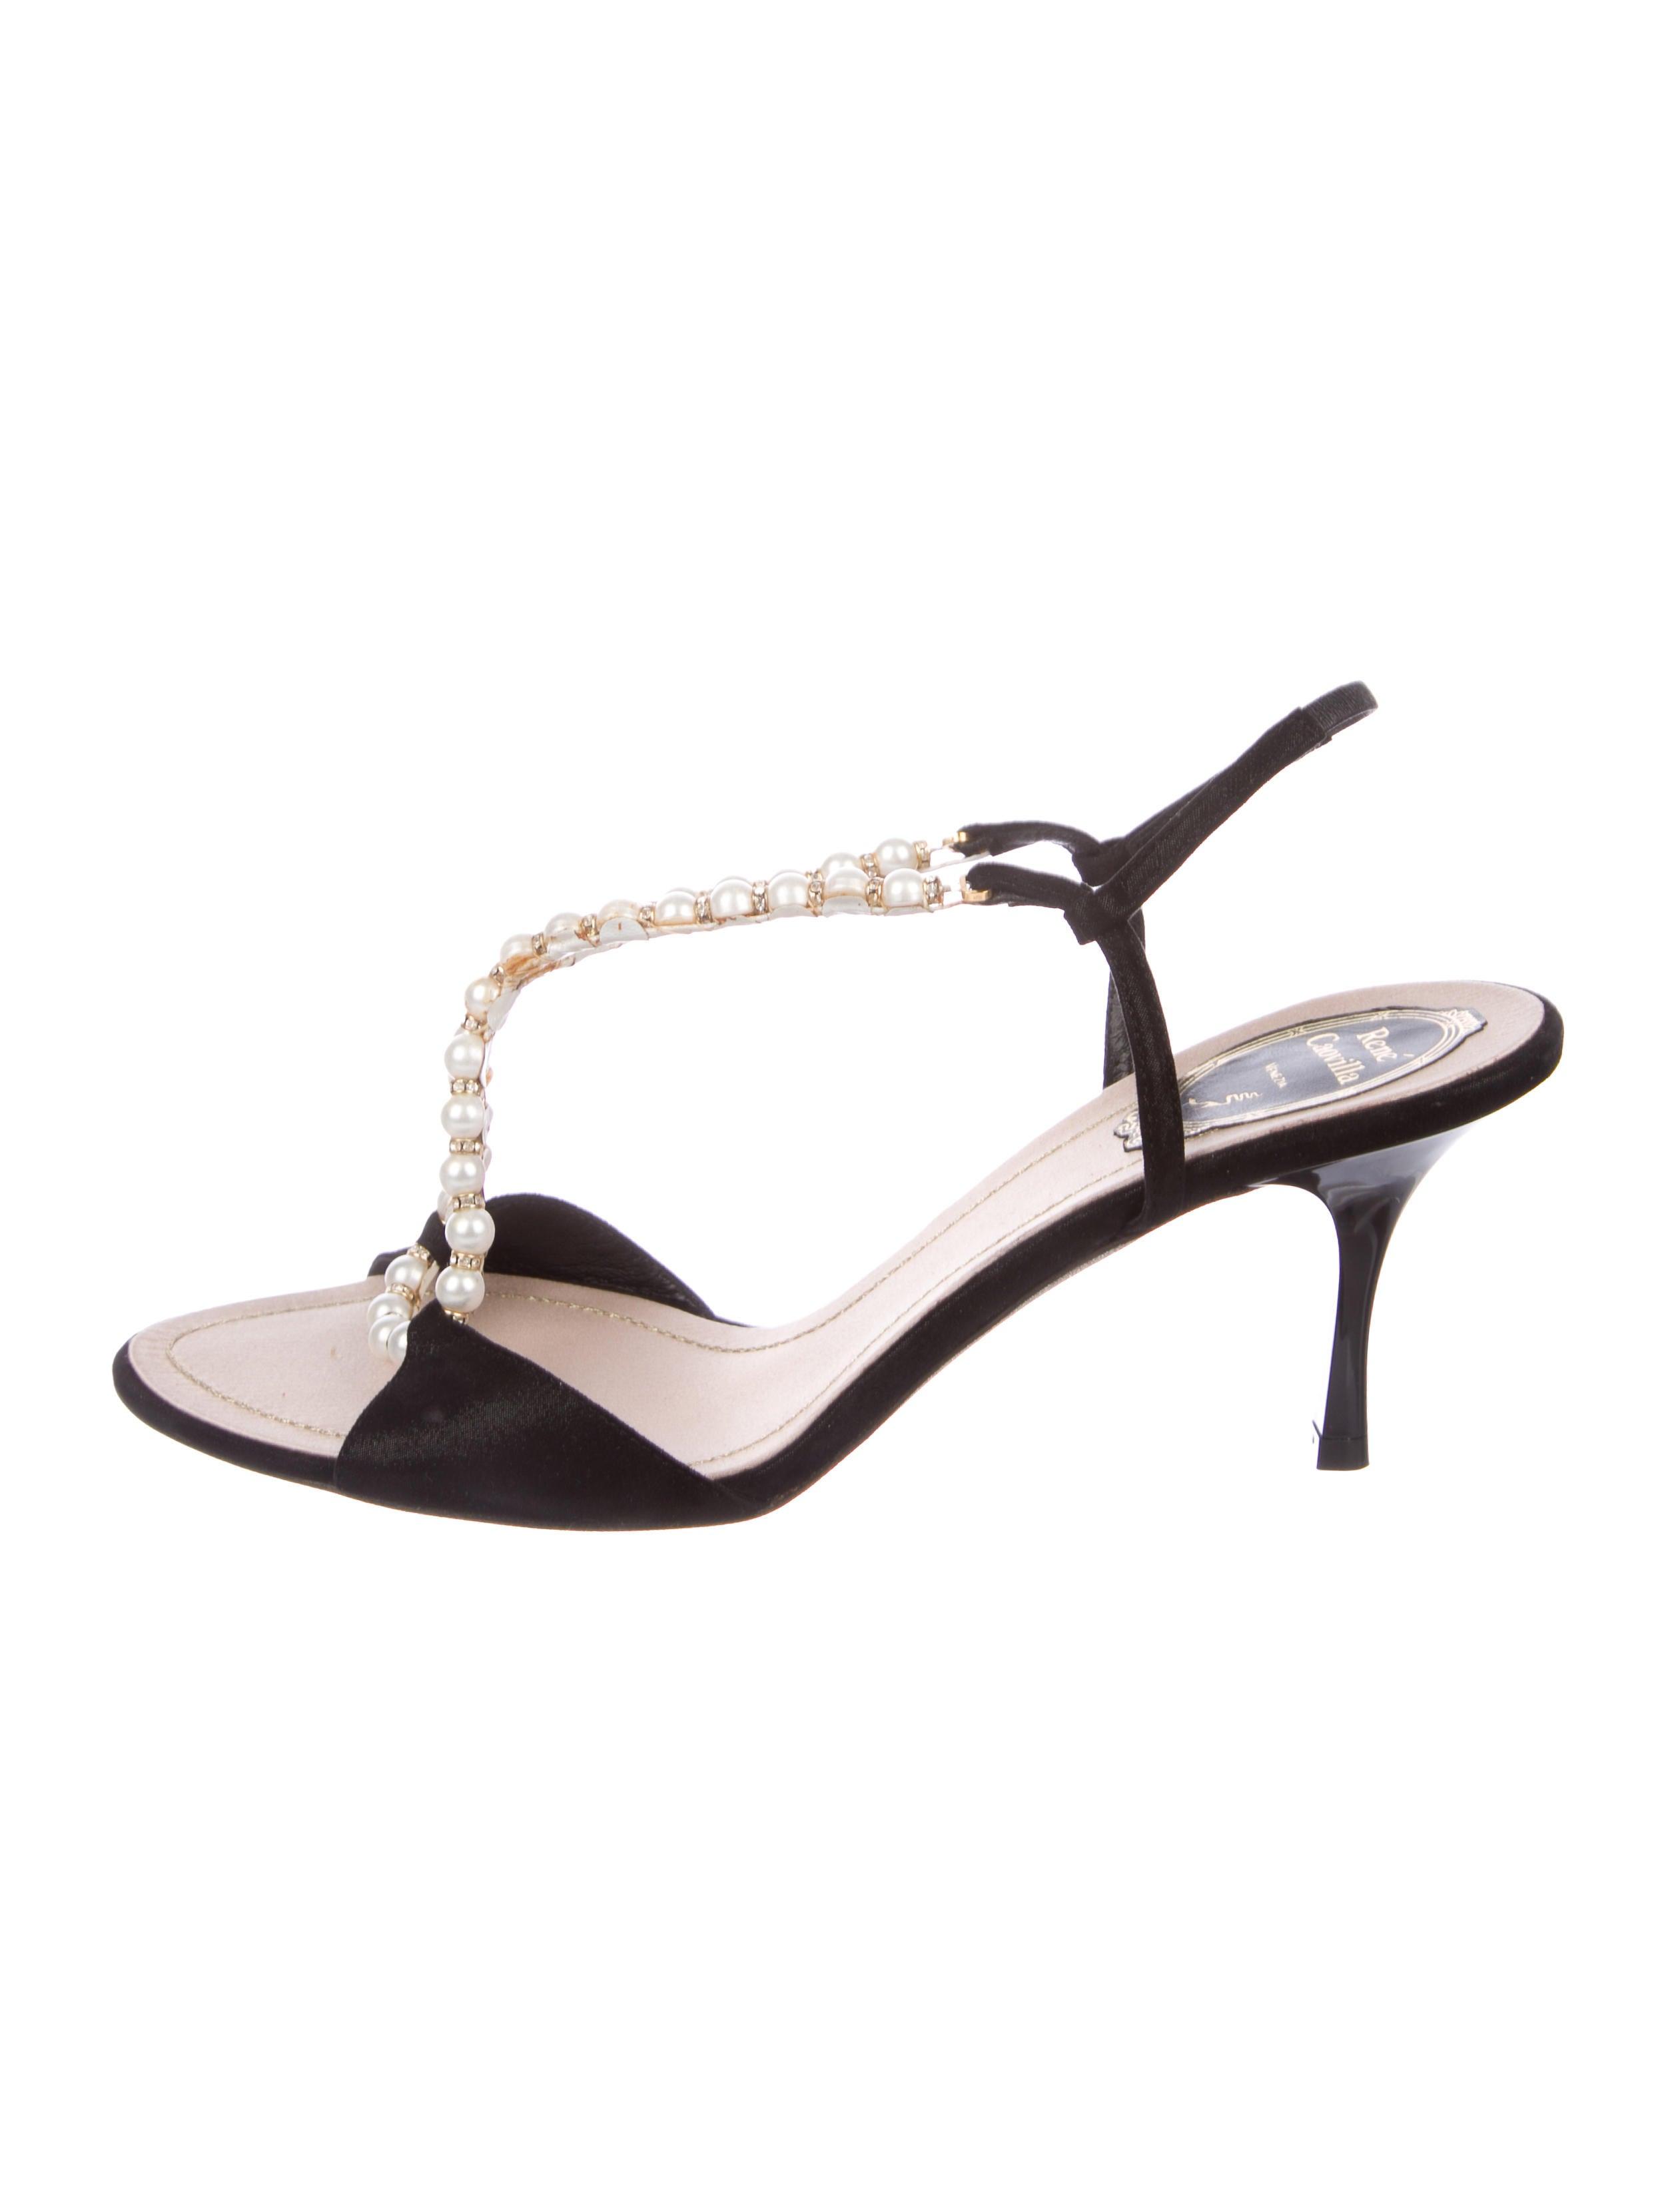 René Caovilla Rene Caovilla Embellished Slingback Sandals w/ Tags under $60 cheap price clearance Inexpensive wDmsMa